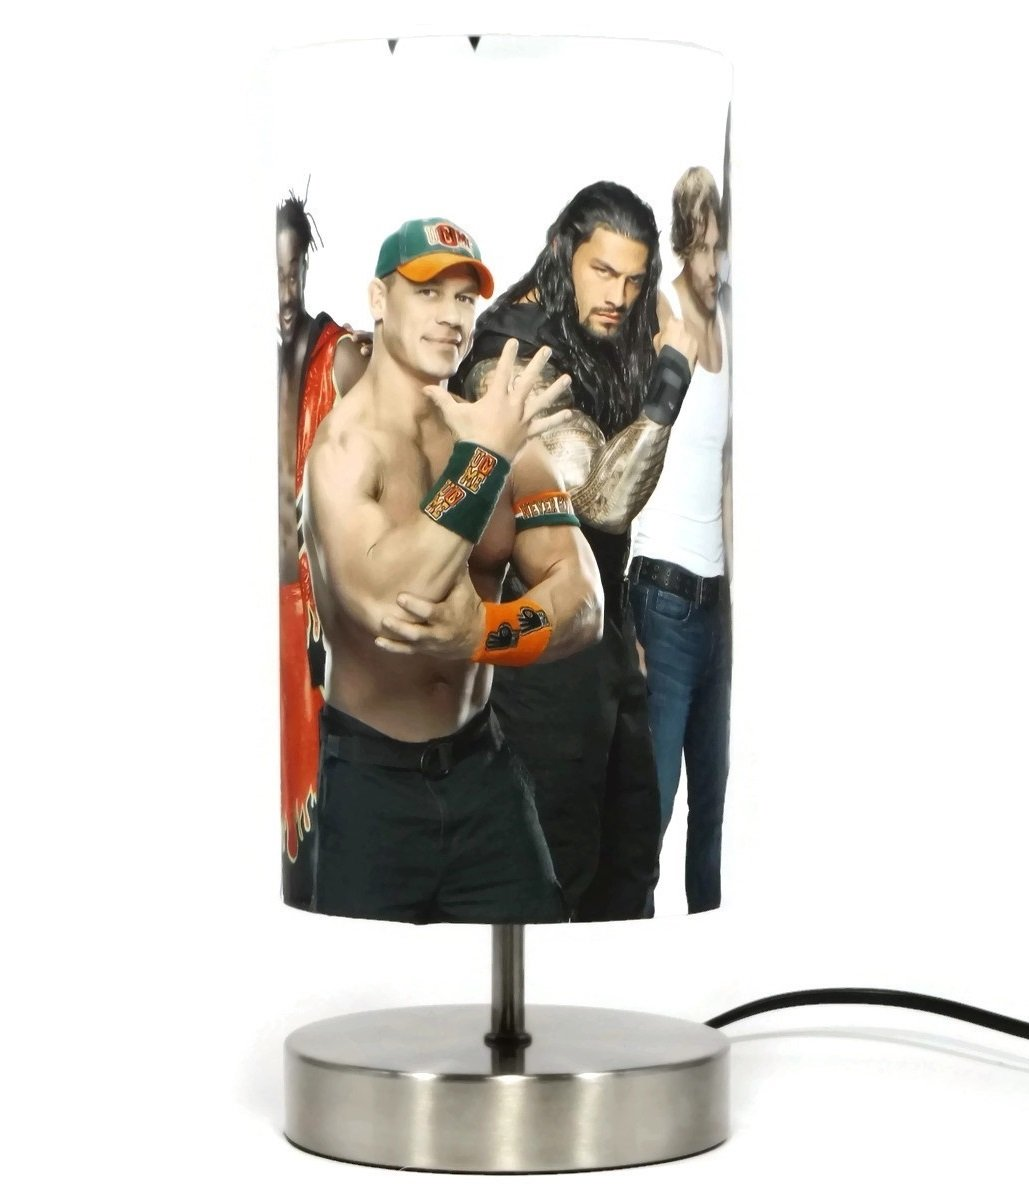 Wwe Wrestling Lamp Light Lampshade Lamps Boys Children S Kids John Cena Bedroom Night Light Accessories Gifts Buy Online In Taiwan At Desertcart Tw Productid 56260335